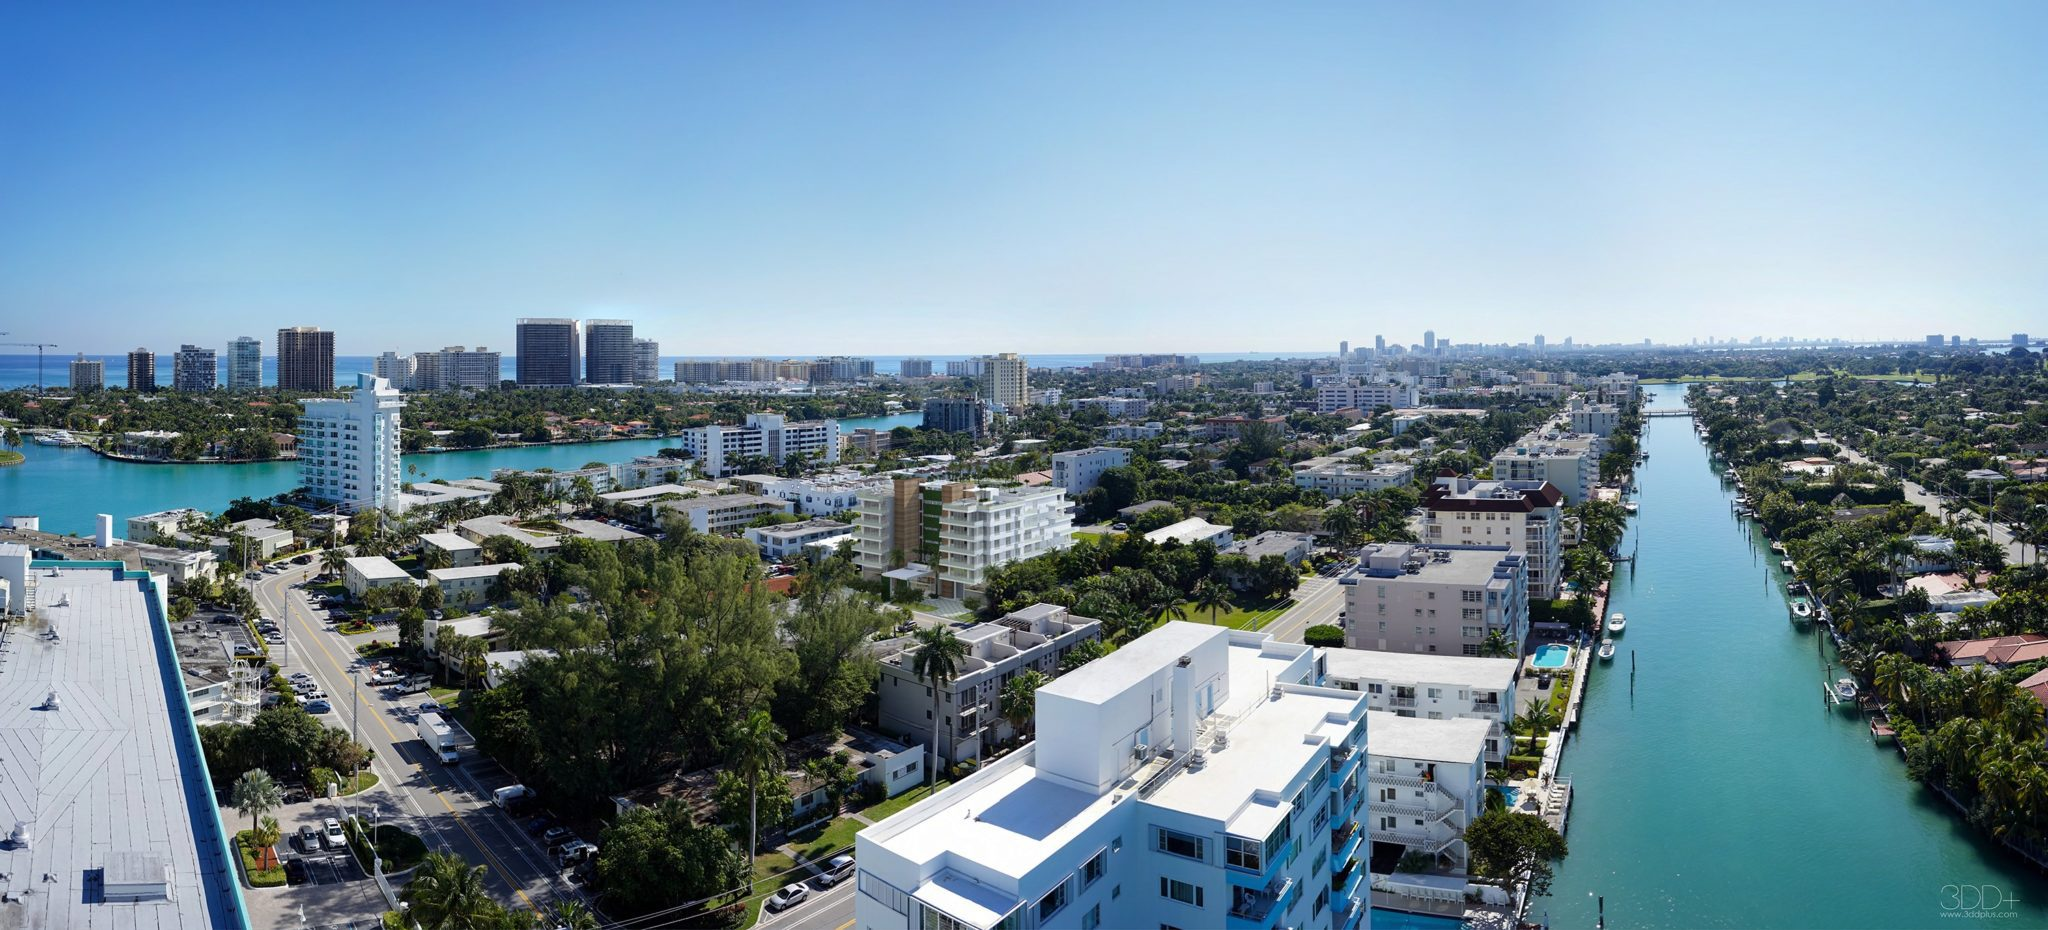 Miami home price July 2016